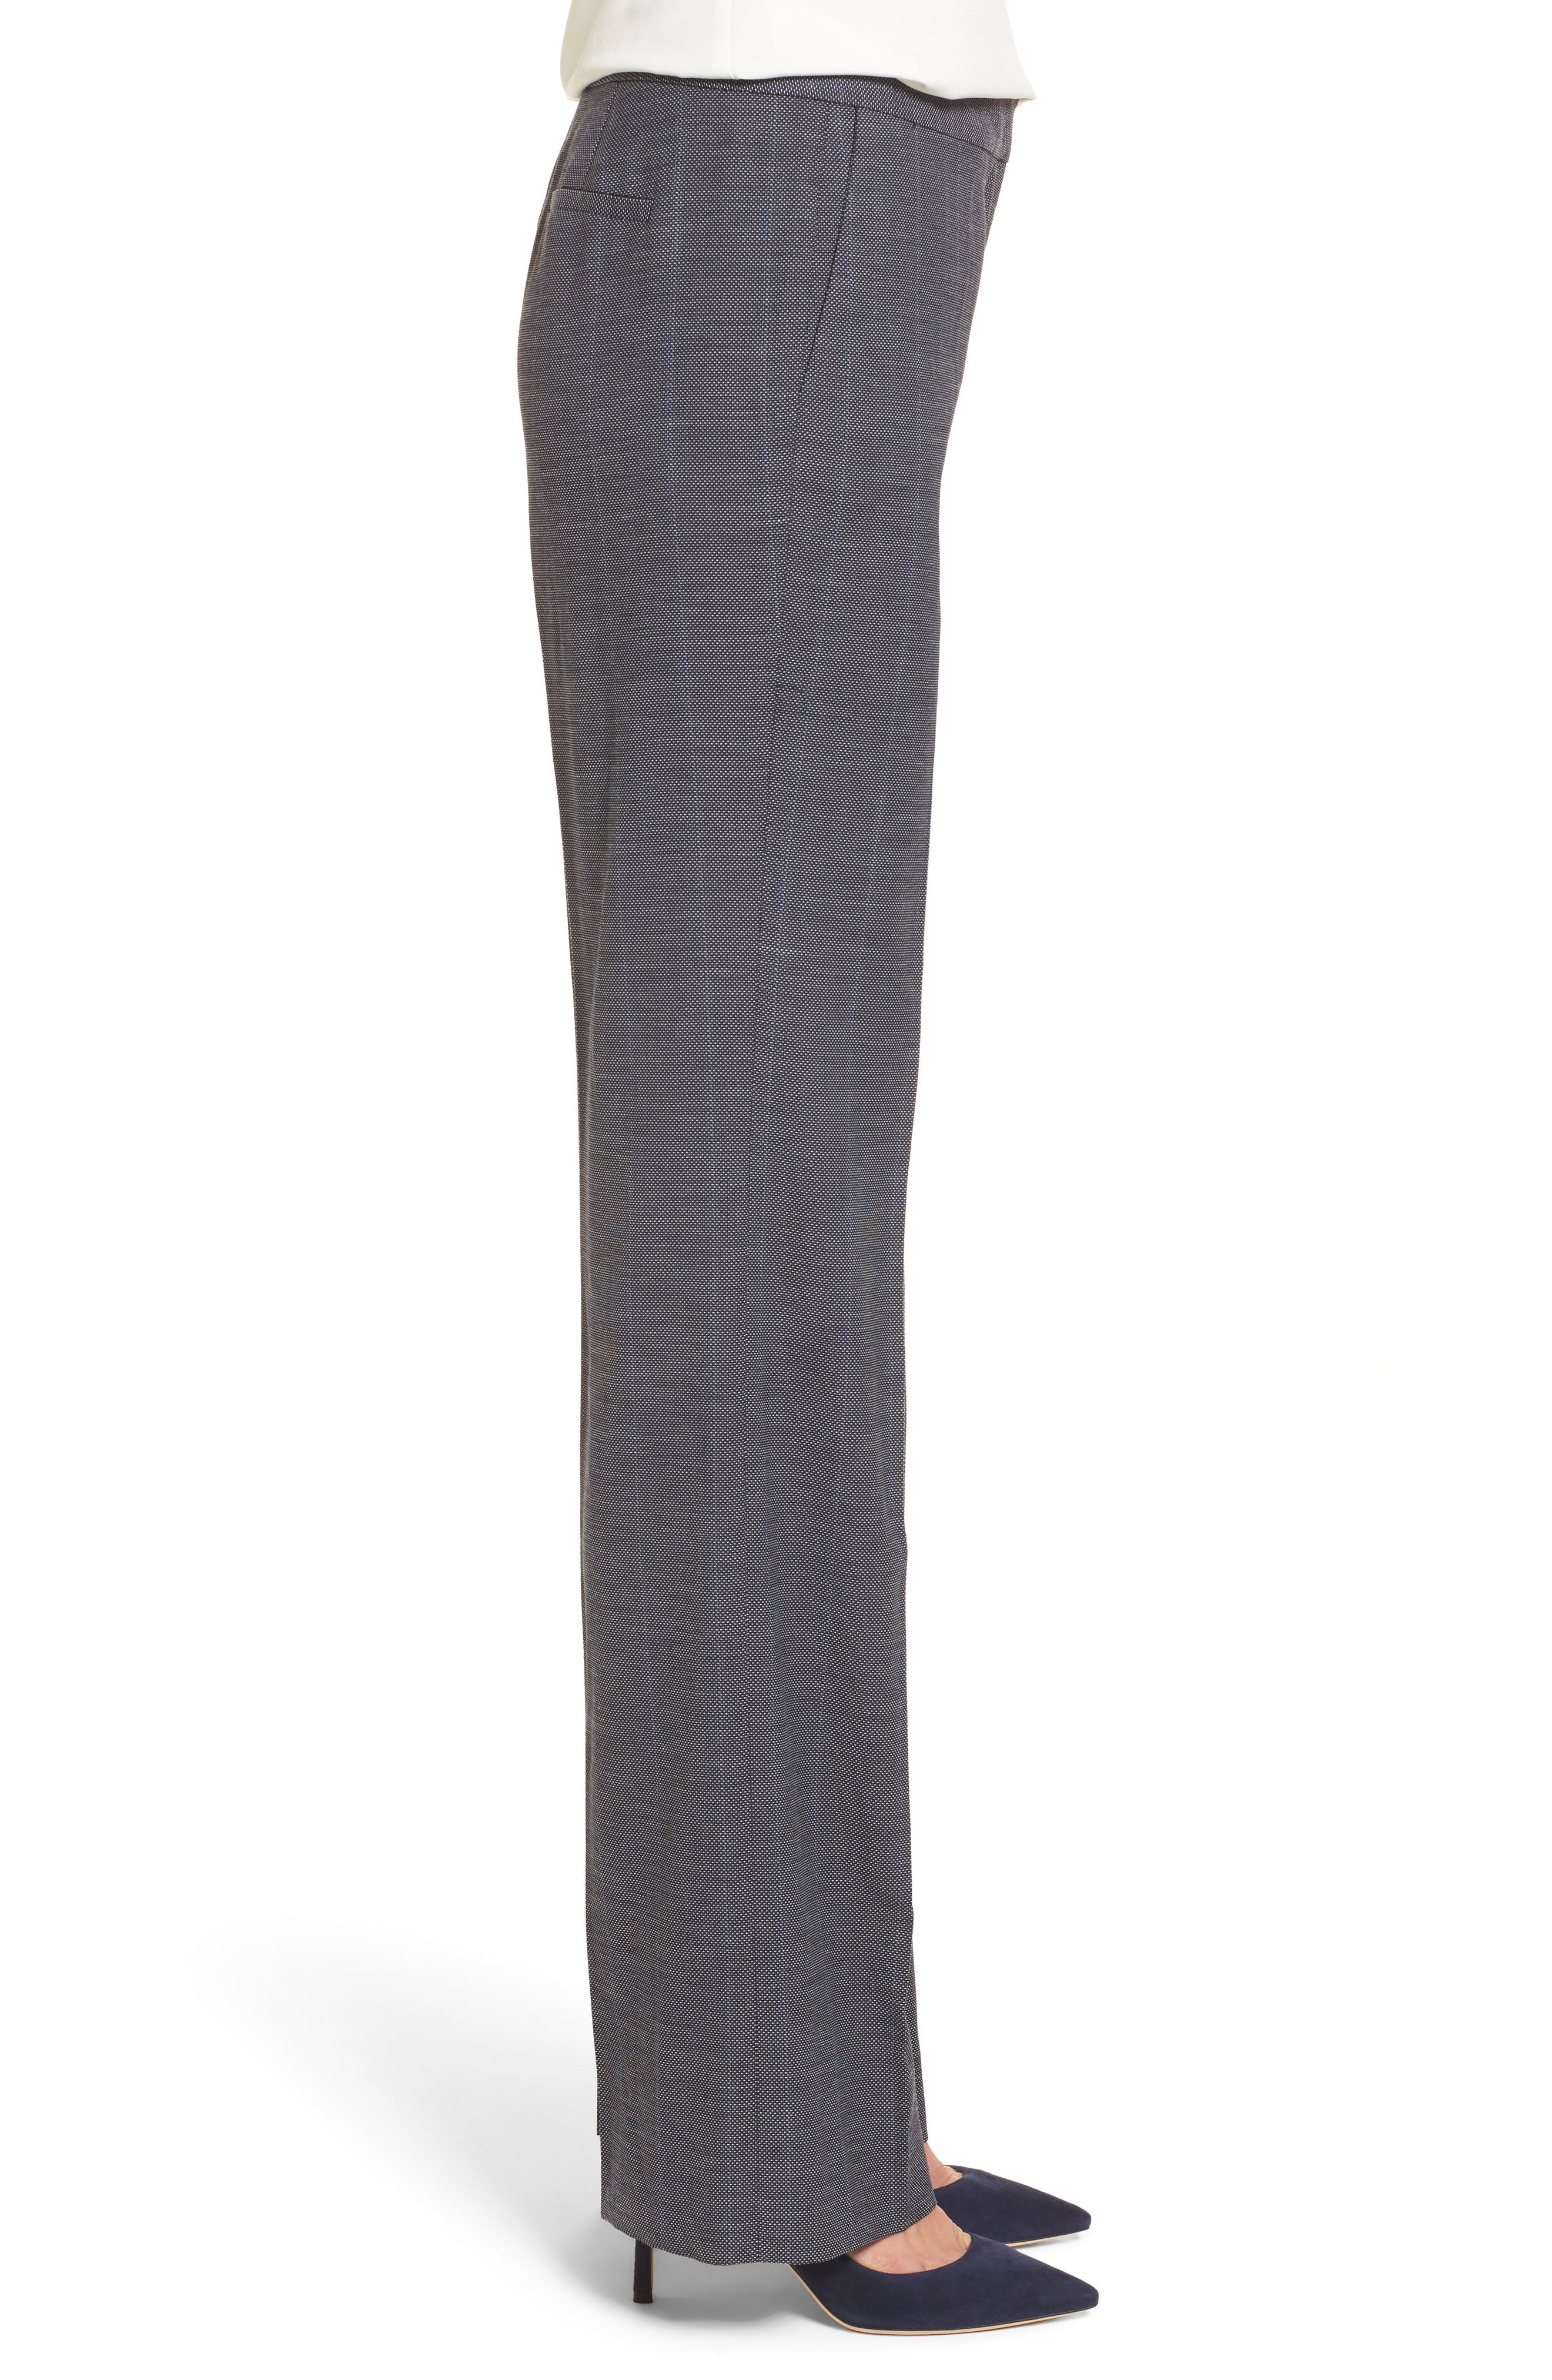 Cross Dye Suit Pants,                             Alternate thumbnail 3, color,                             Navy Crossdye Pattern